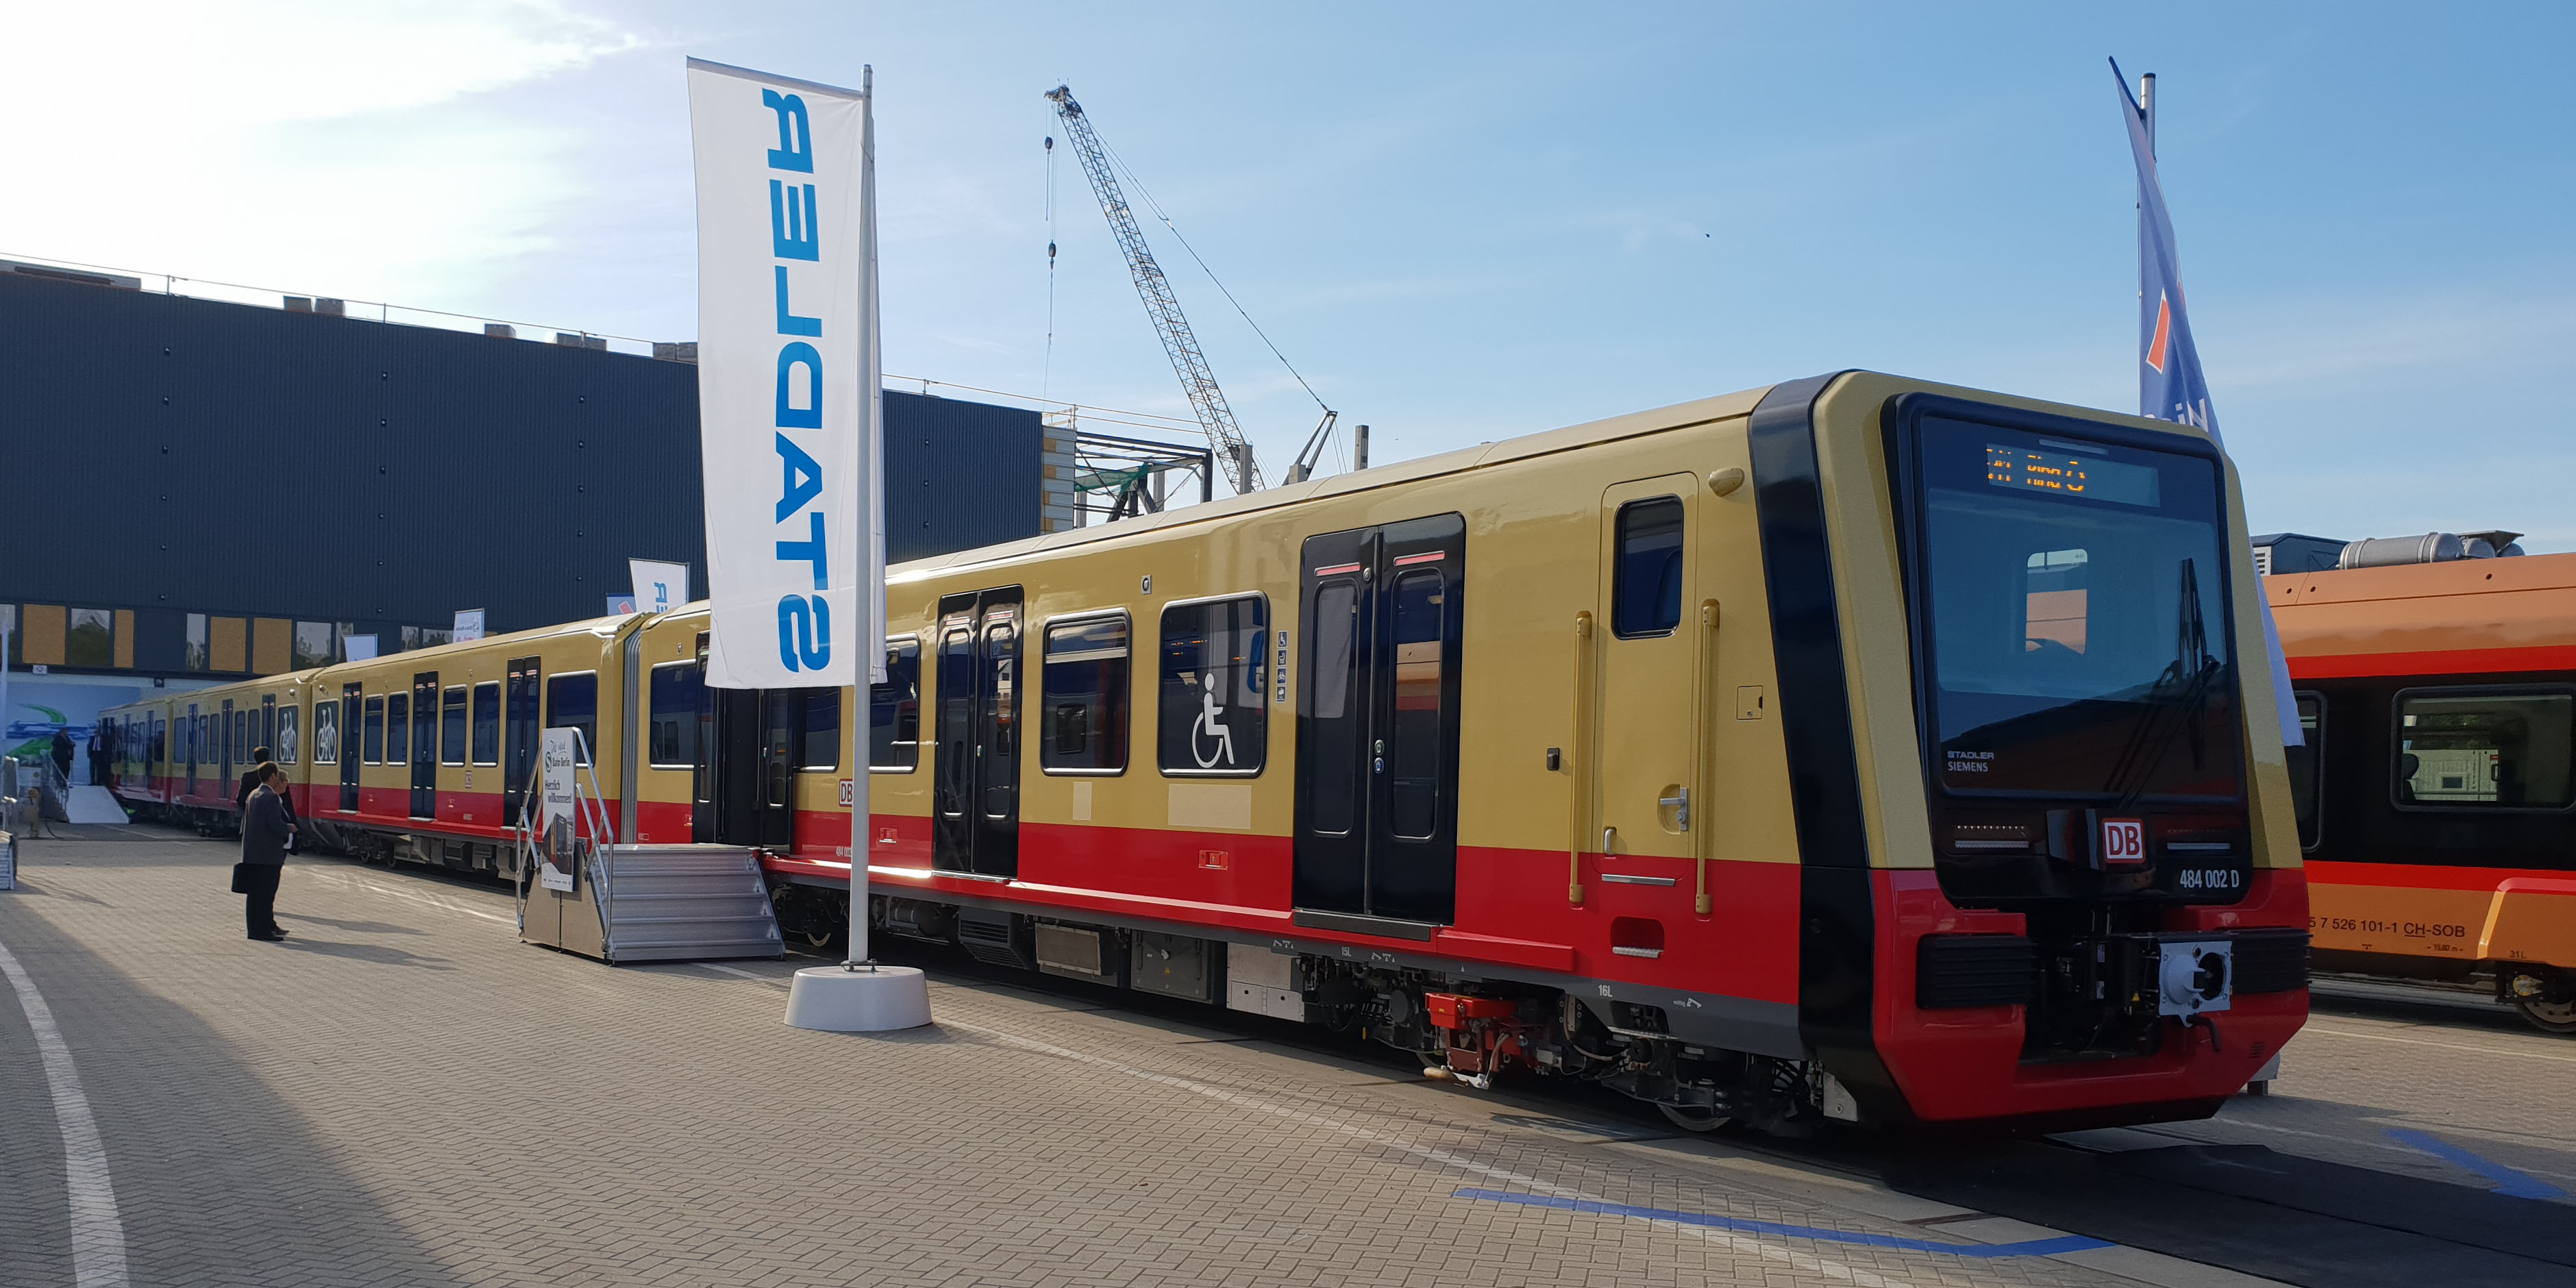 Foto: S-Bahn 484 002 D, Baureihe 483/484, Innotrans, Berlin, September 2018